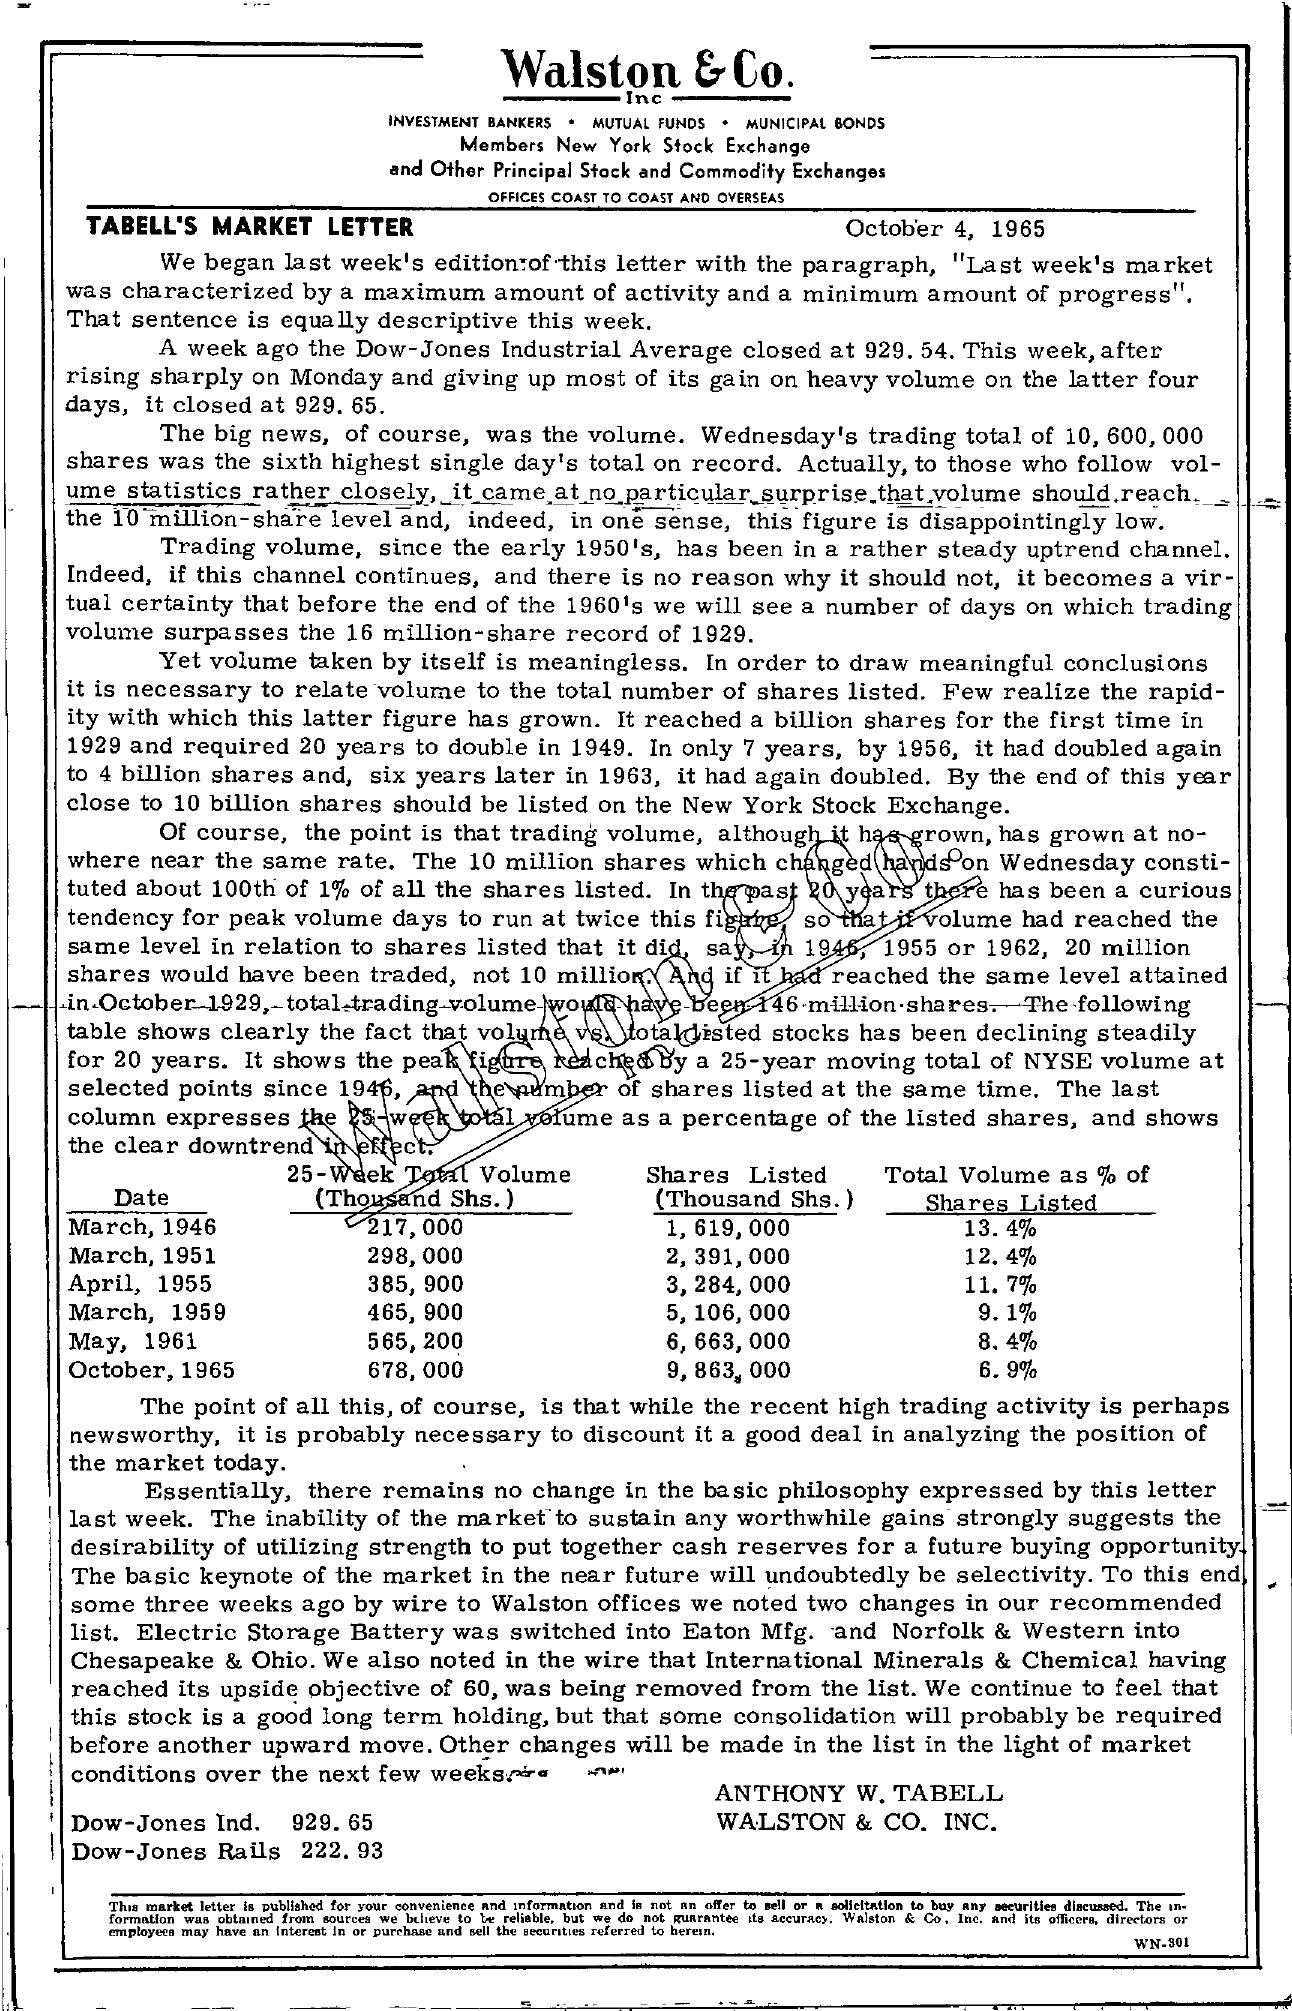 Tabell's Market Letter - October 04, 1965